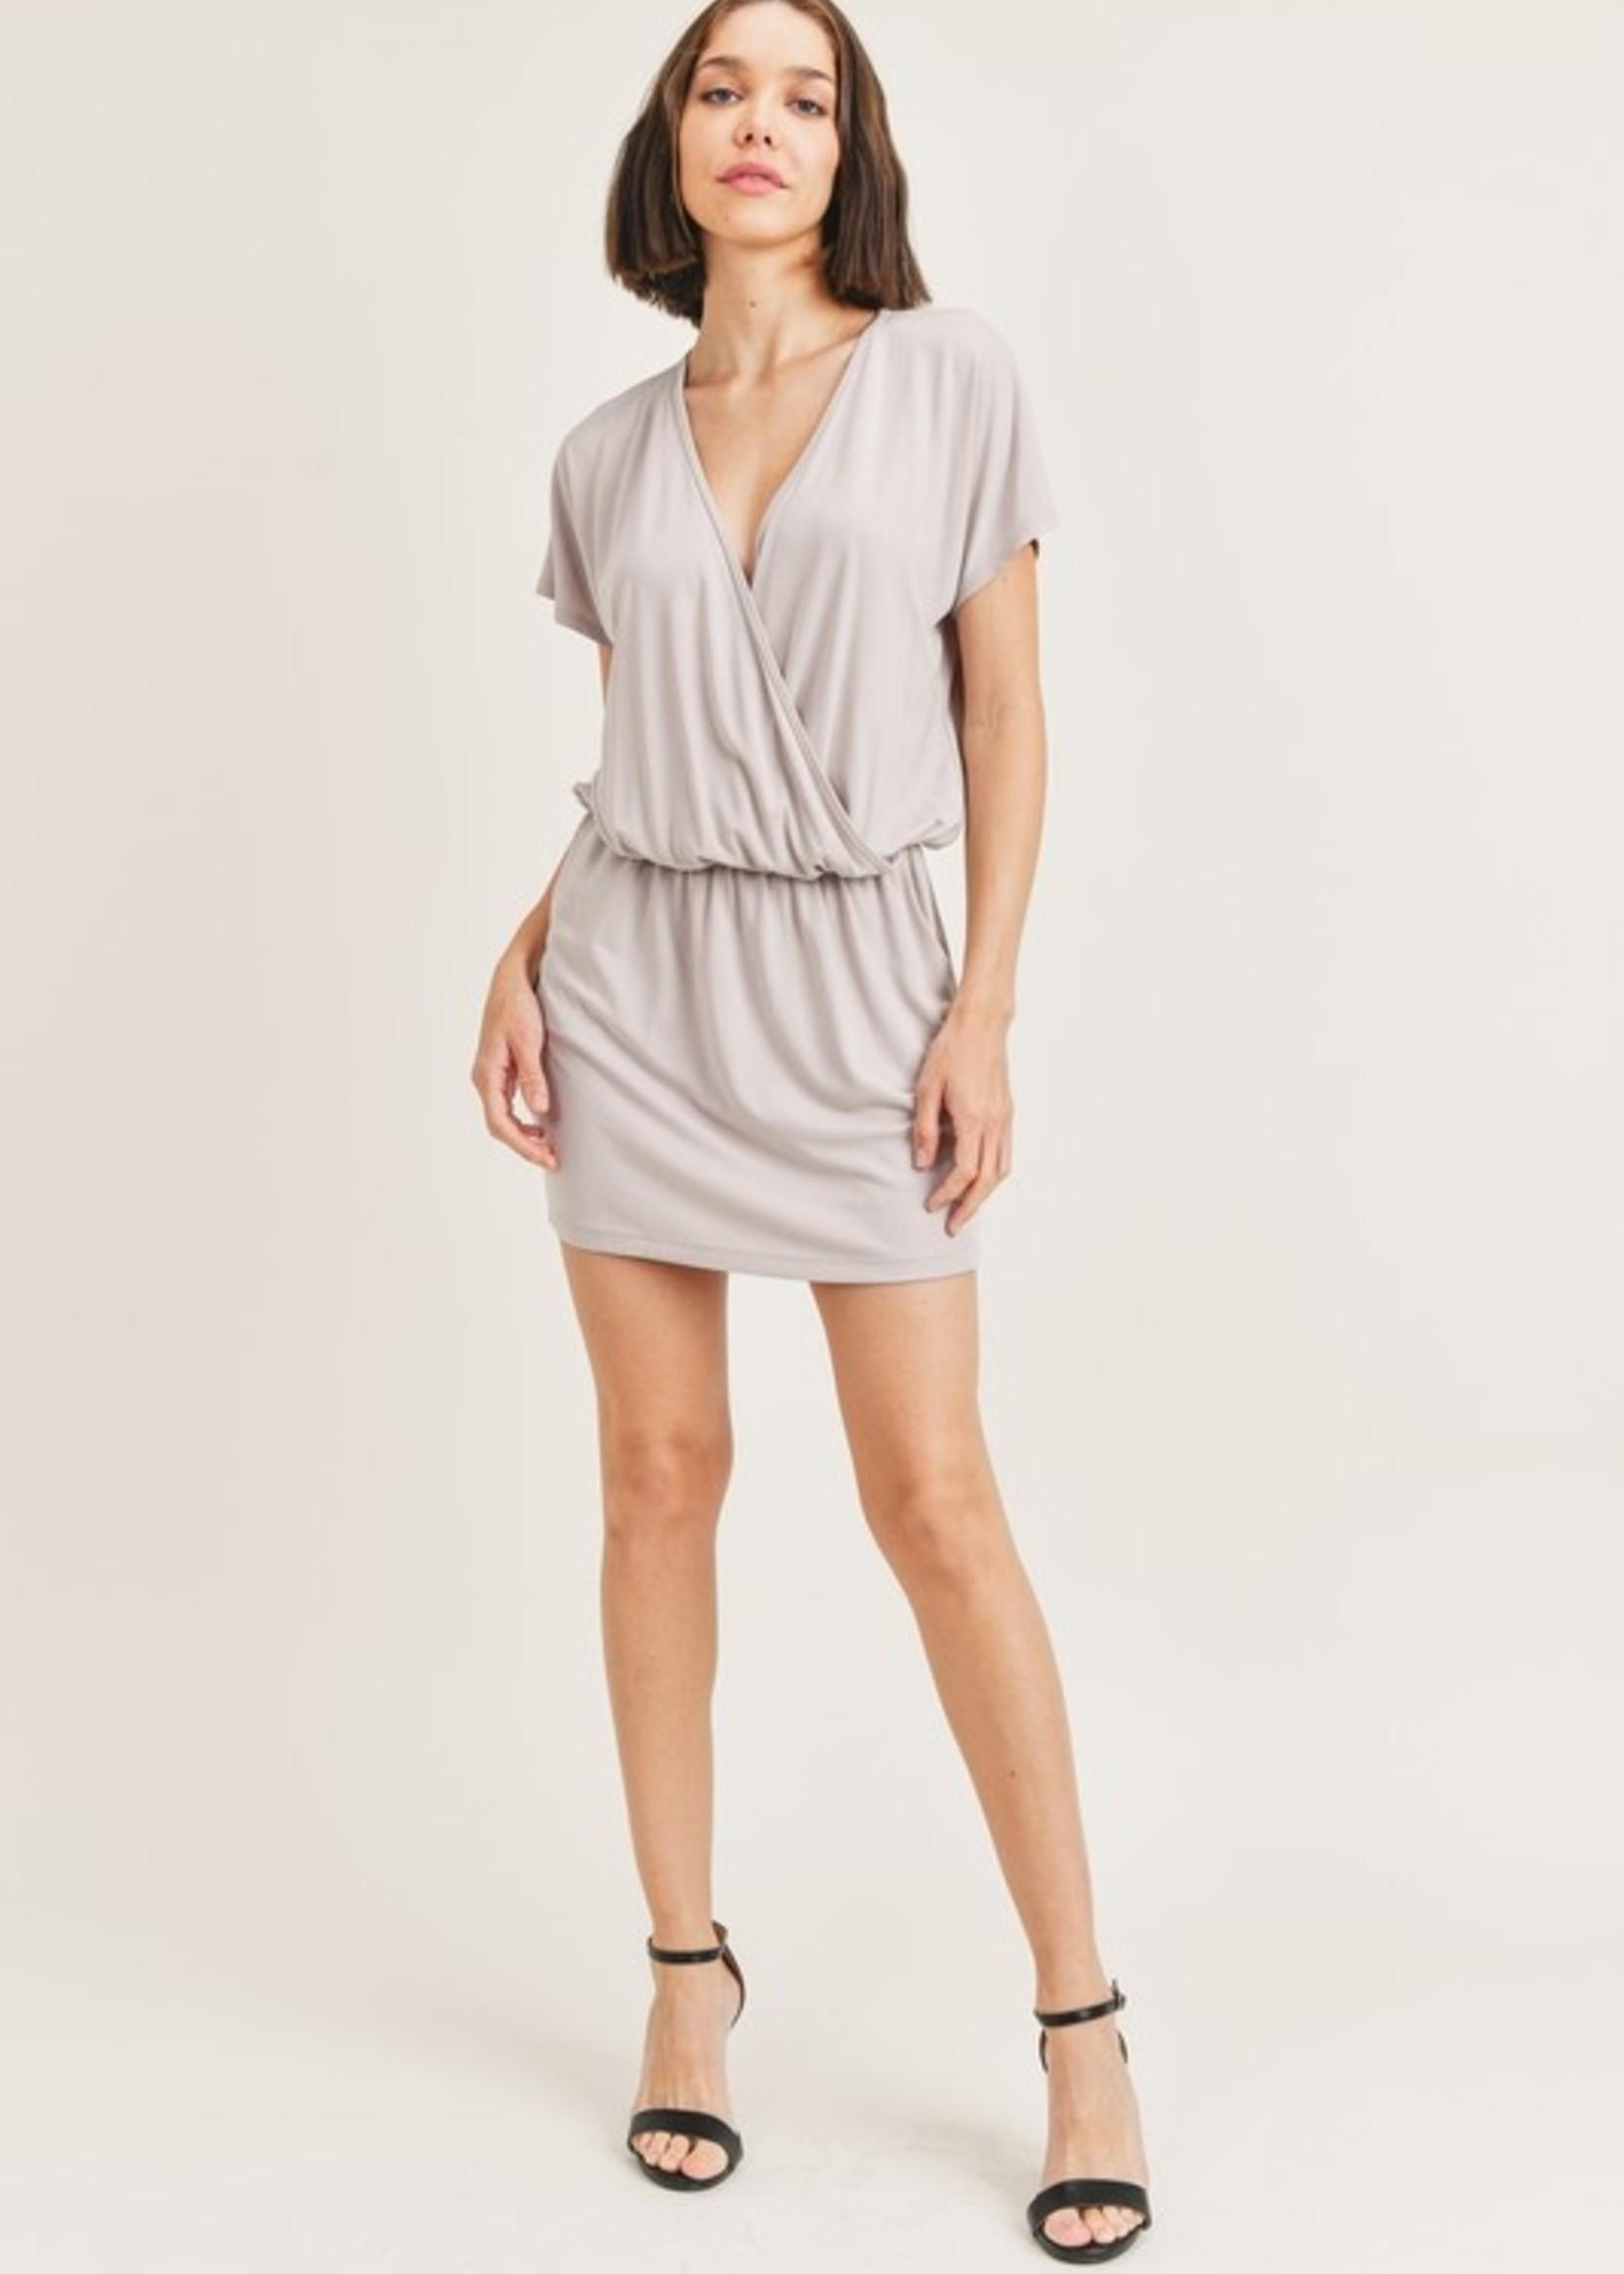 Surplice mini dress